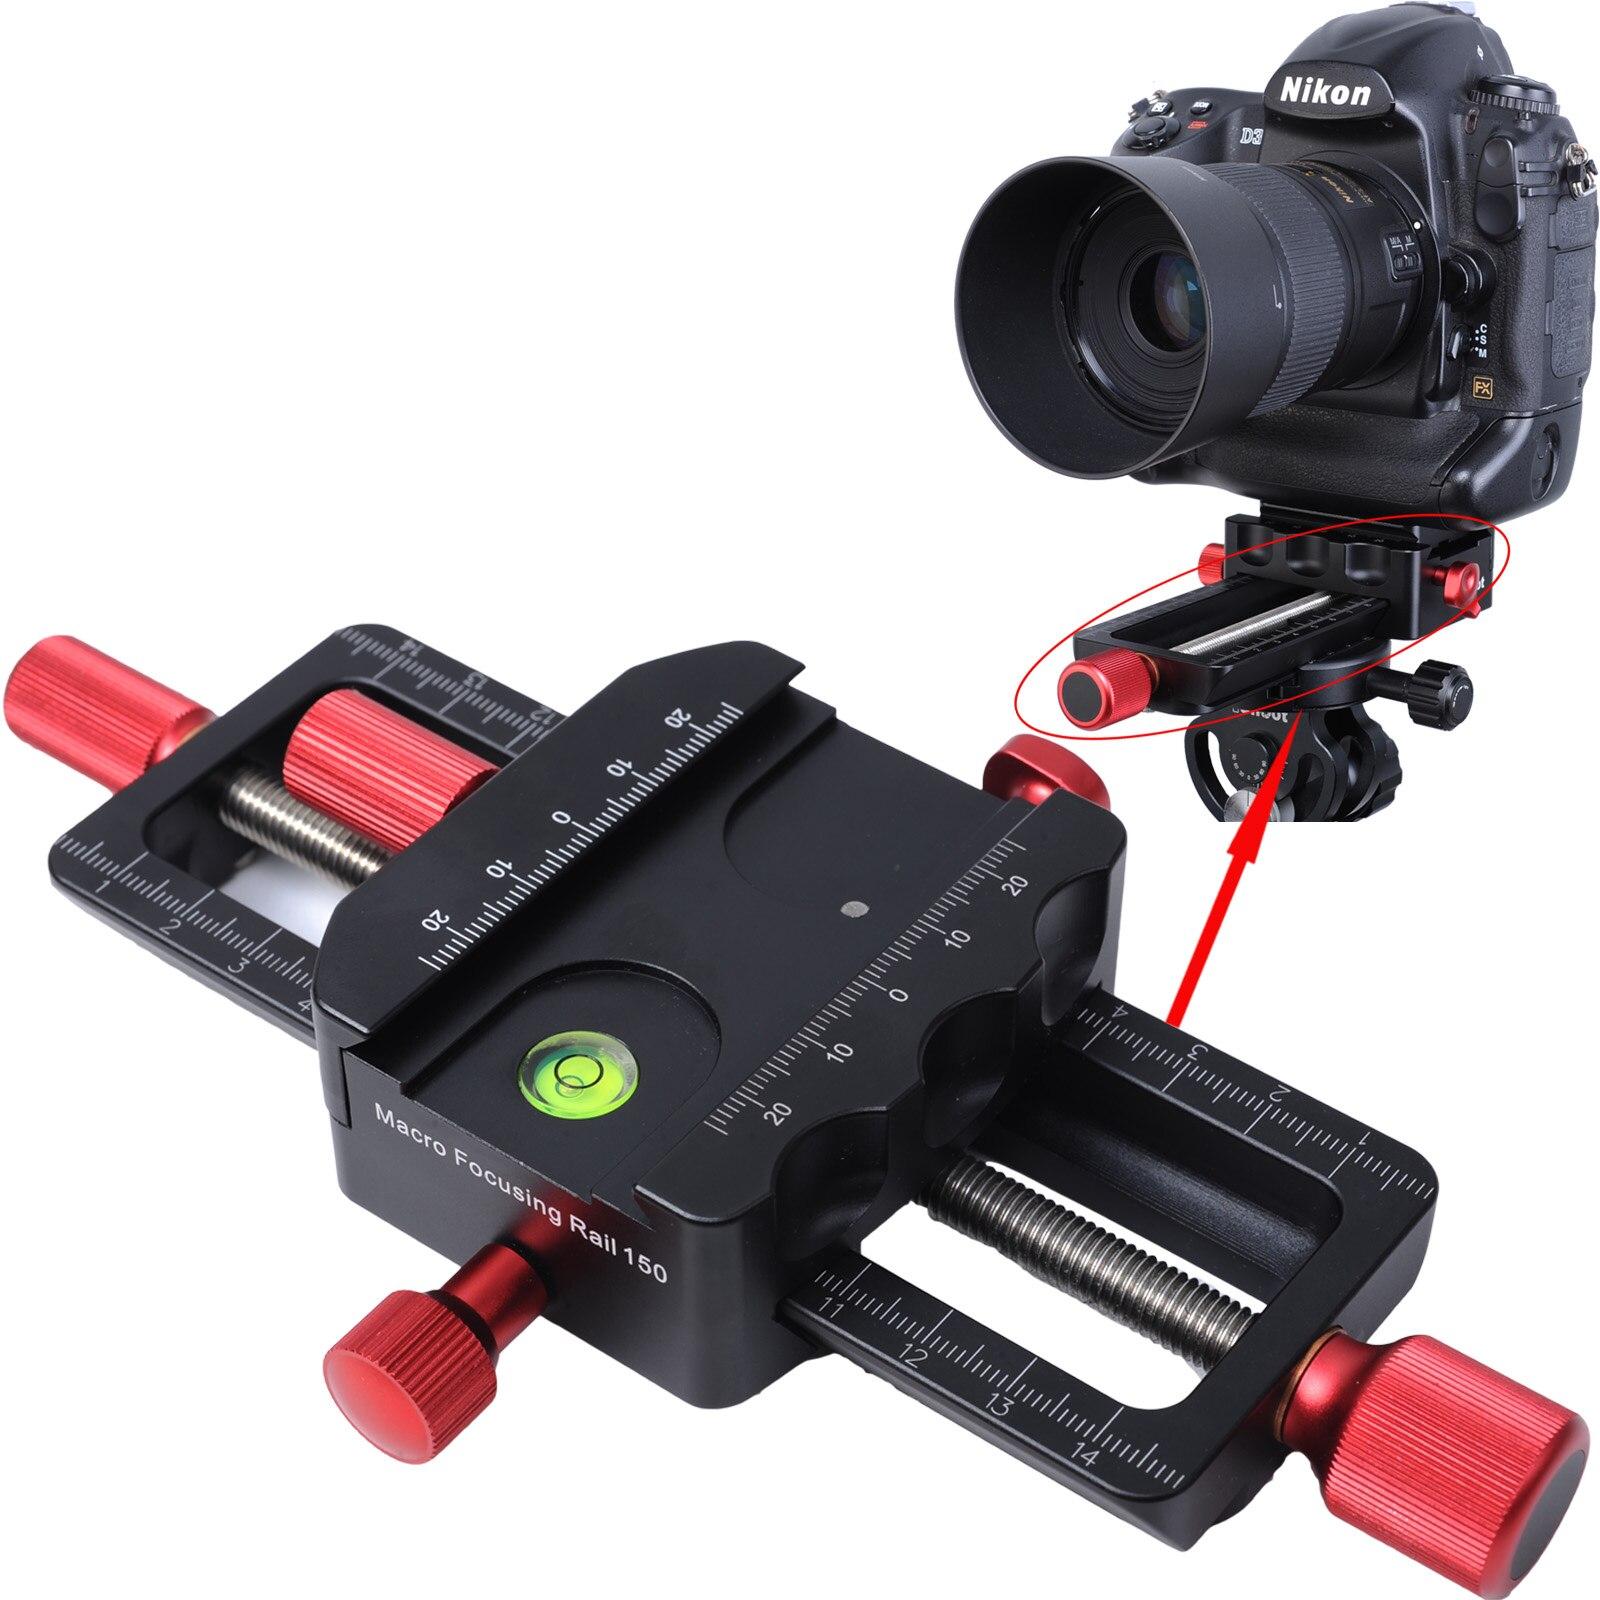 150mm 매크로 포커싱 레일 슬라이더 근접 촬영 헤드 (arca-swiss fit clamp 포함) 삼각대 볼 헤드 용 퀵 릴리스 플레이트